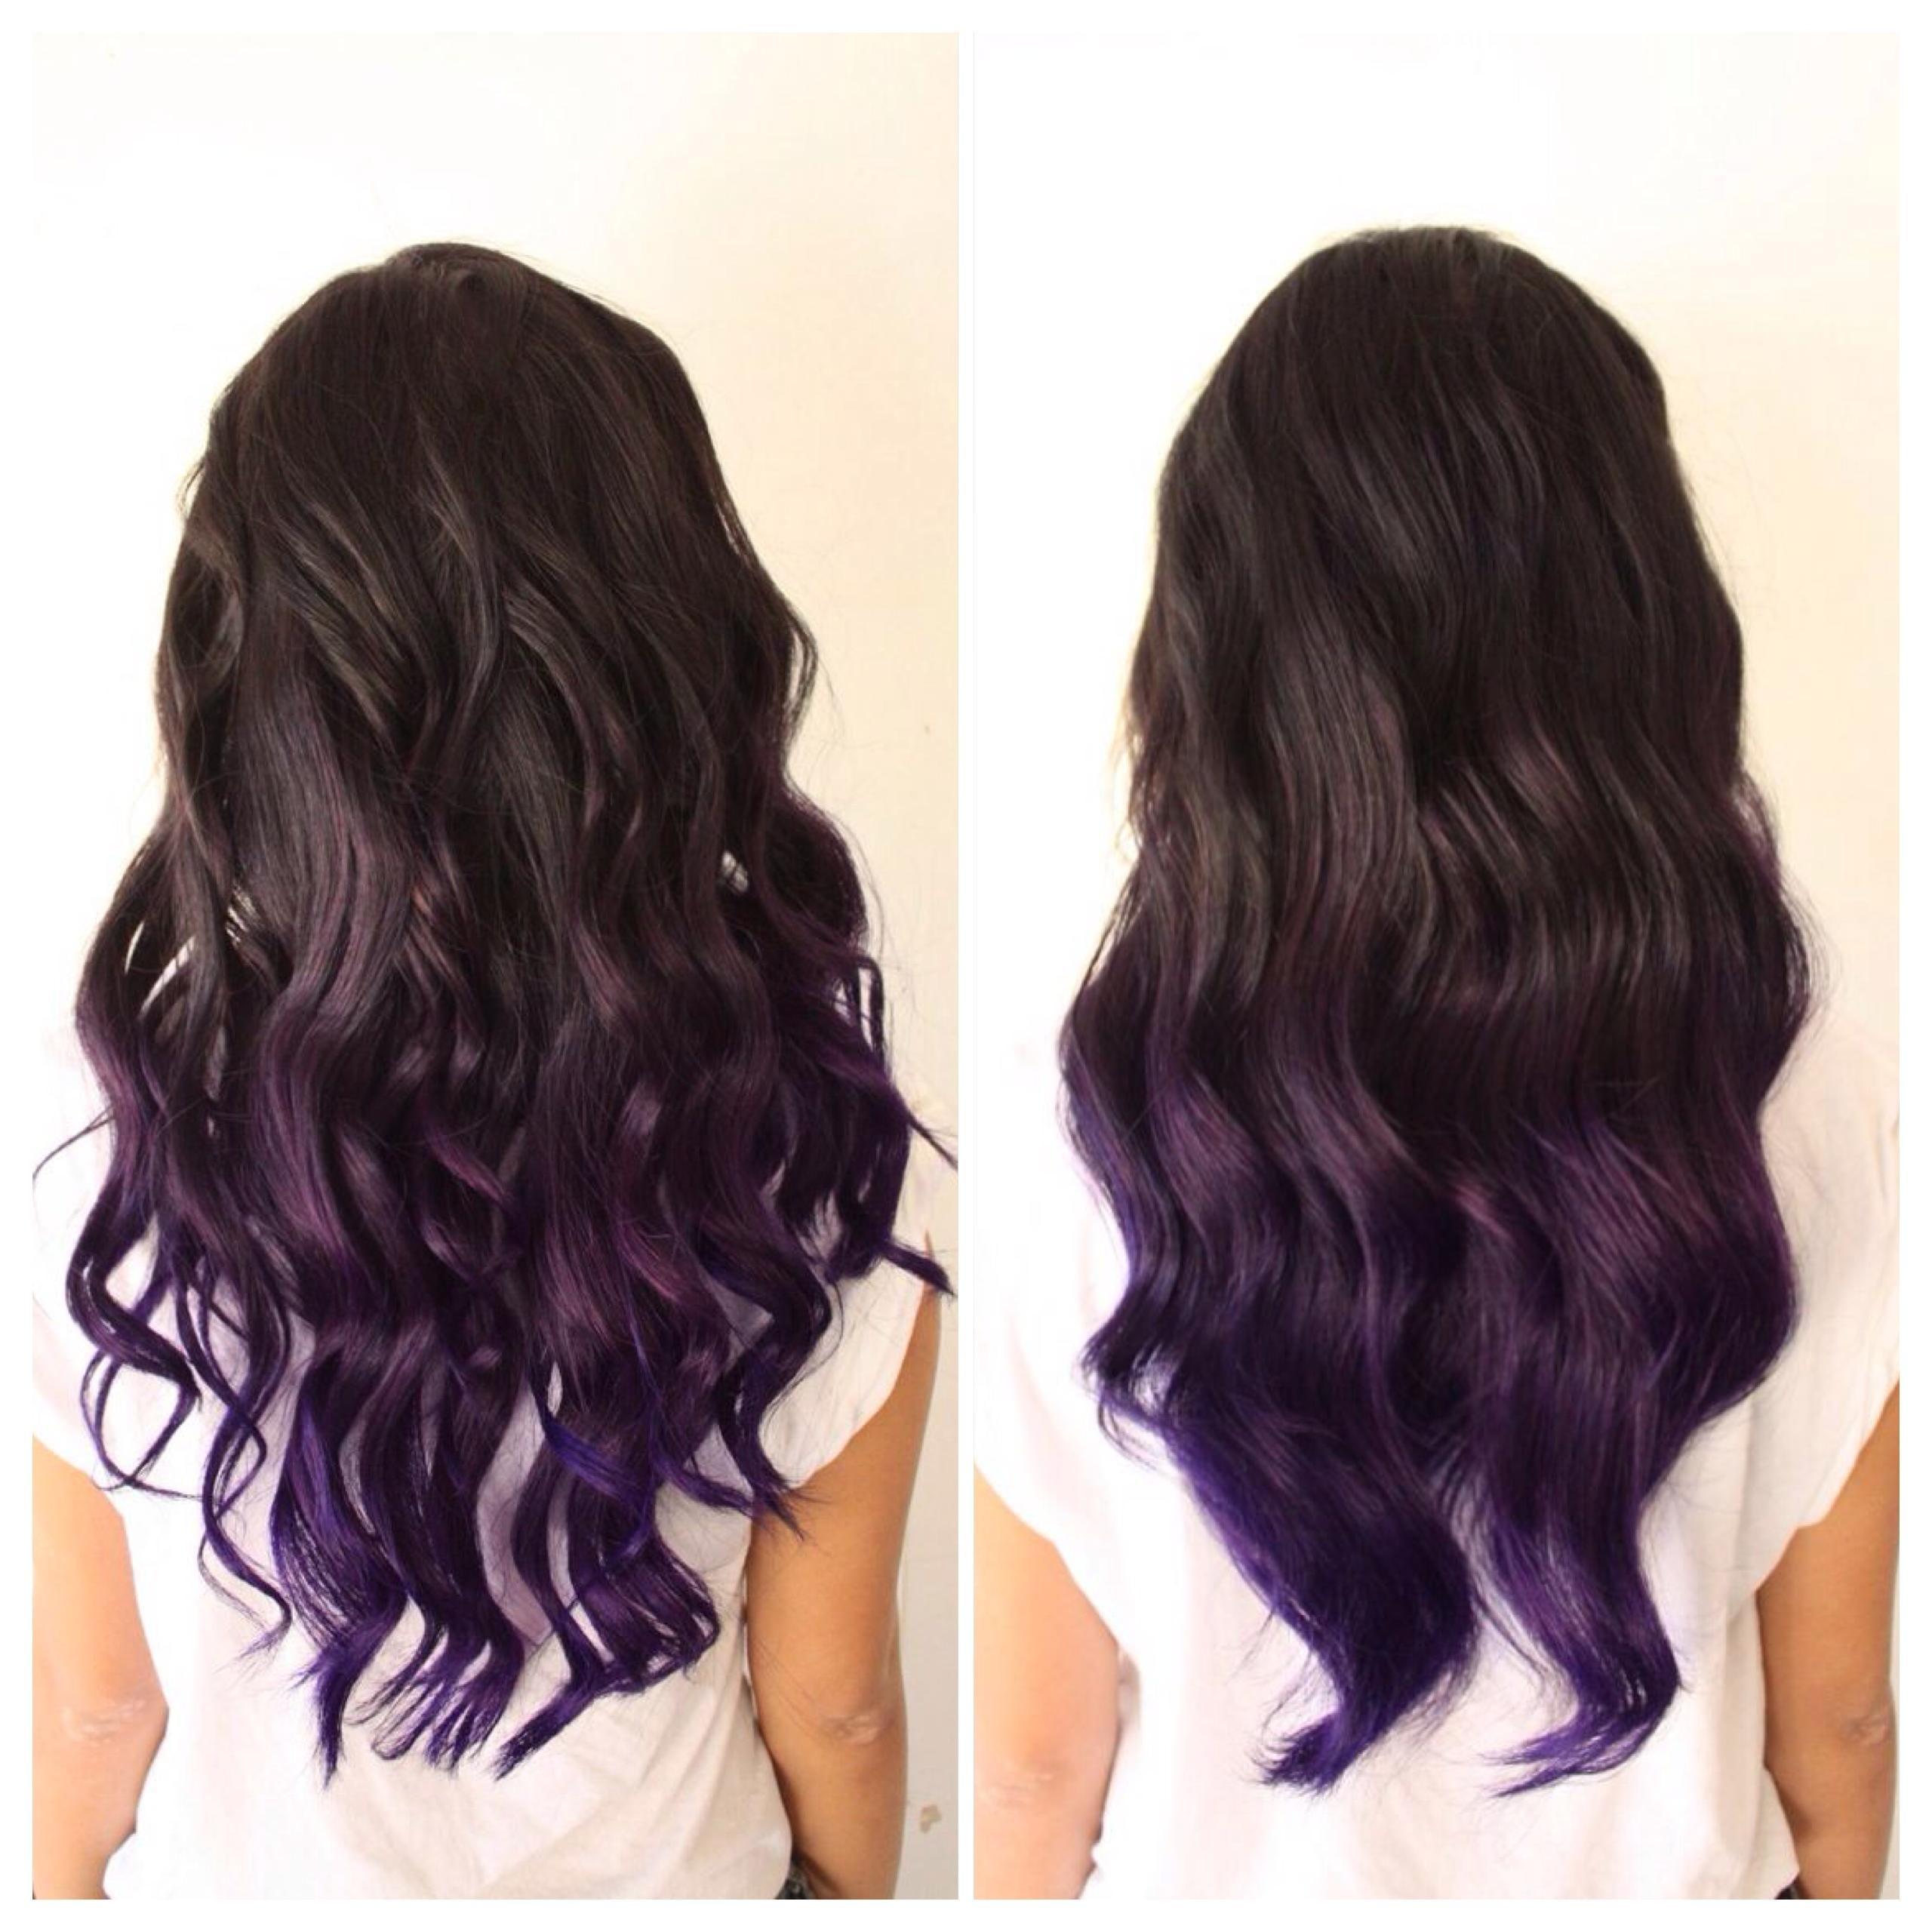 Ballayage Blond destiné purple ombre | purple ombre, ombre and hair coloring